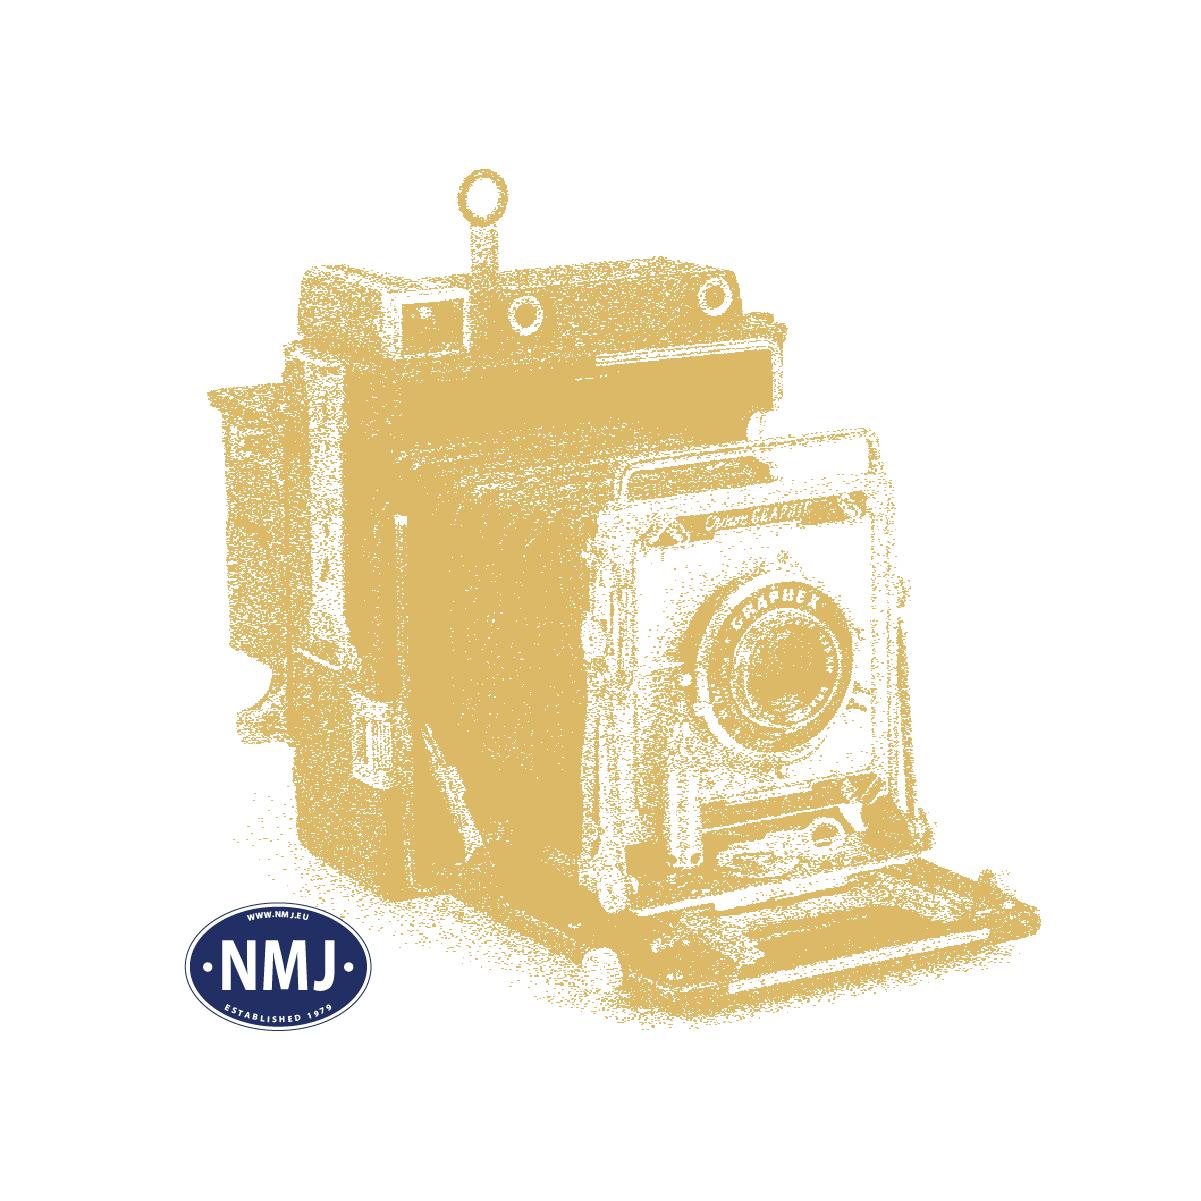 Topline Lokomotiver, nmj-topline-94110-nsb-el14-2176-big-snow-plow-dc, NMJT93110